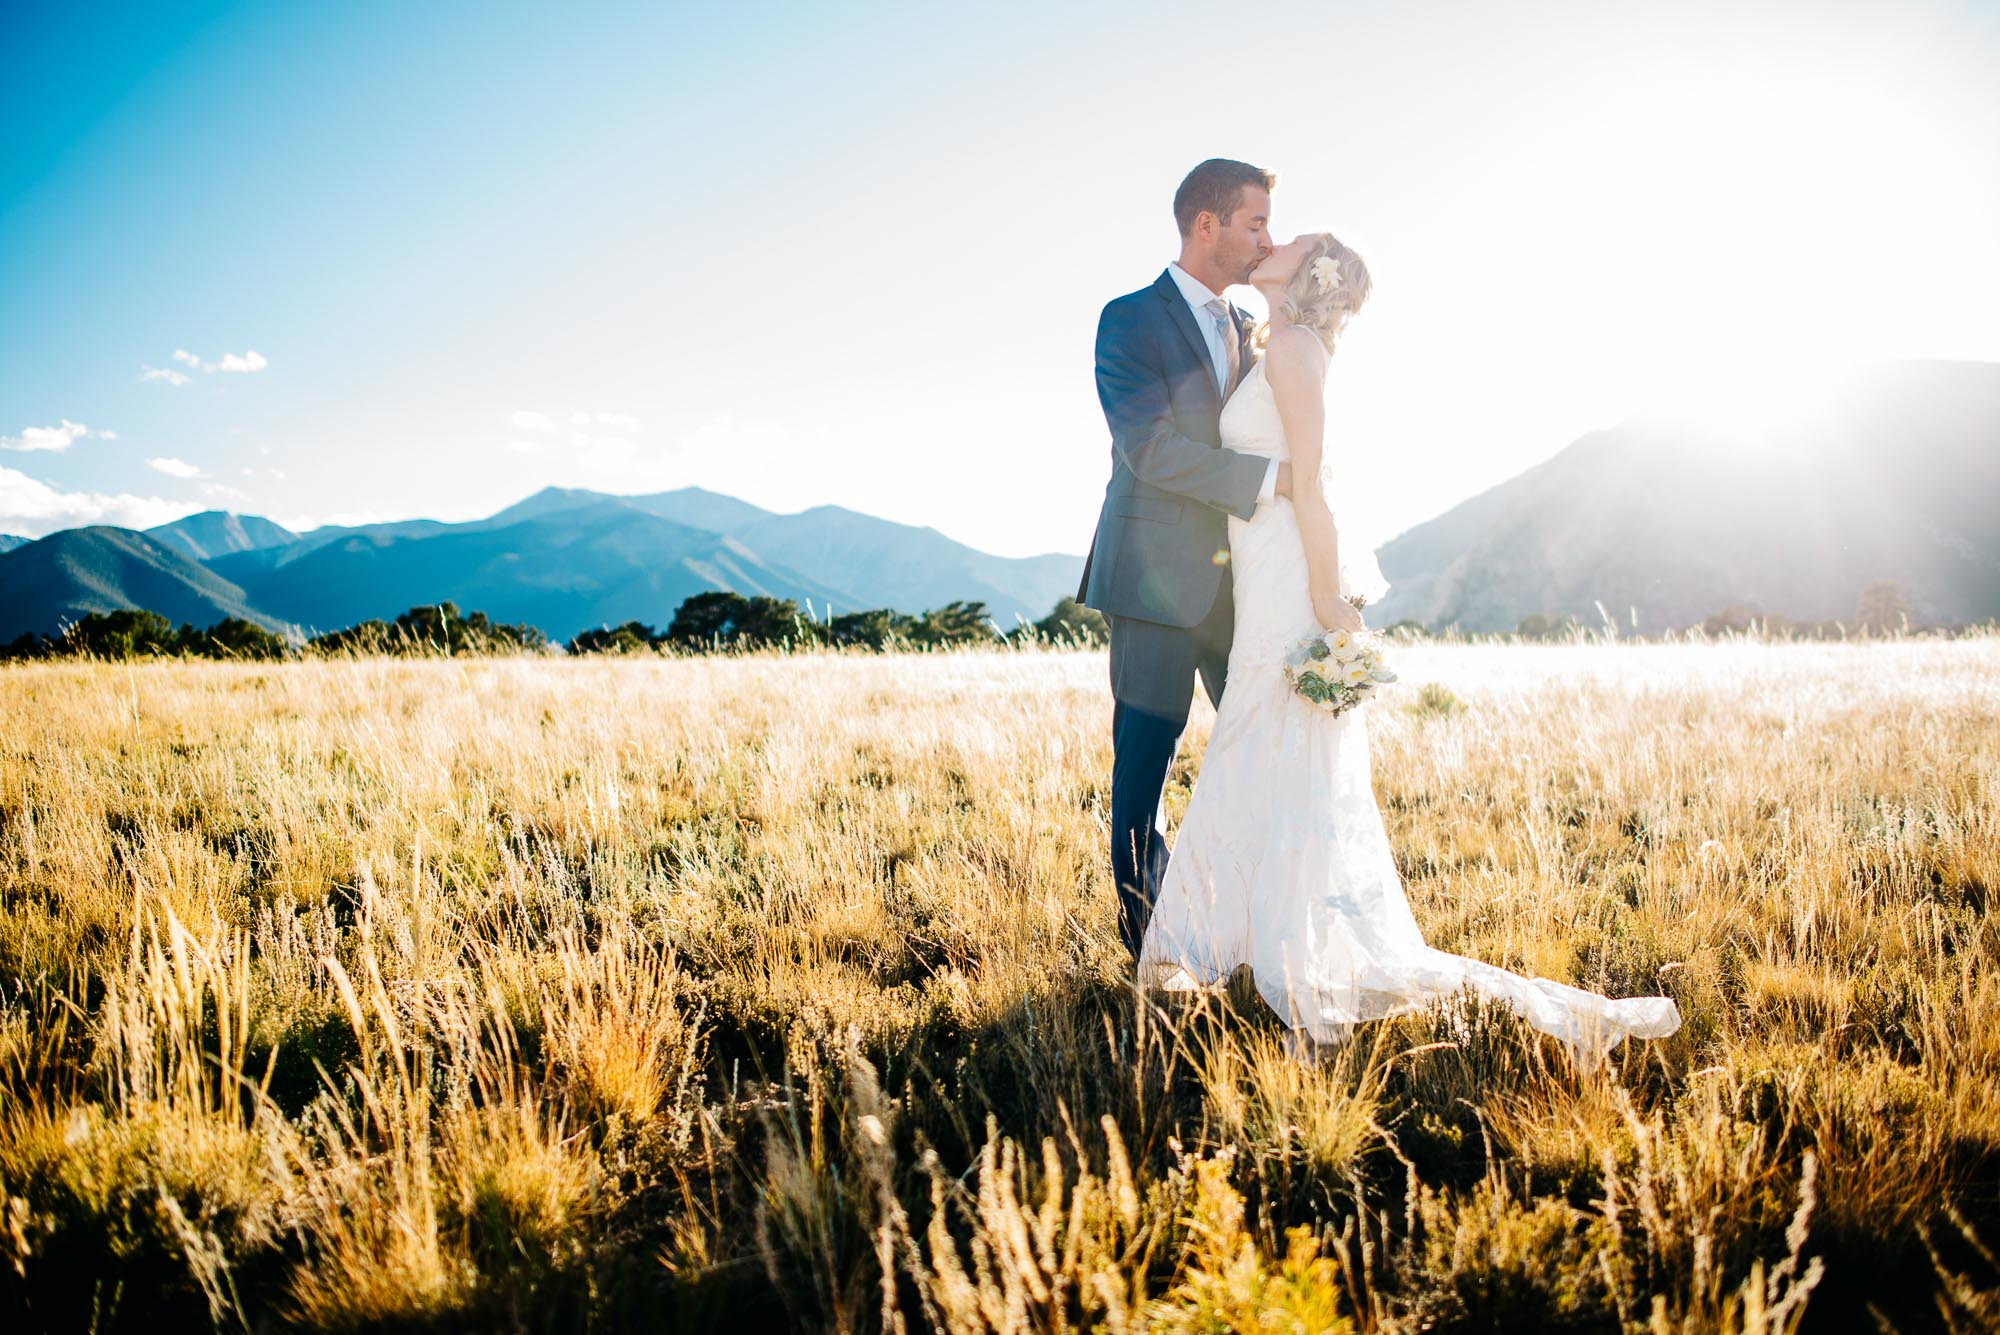 110elopement-photographer-colorado-mount_princeton_mountain_wedding_photographer_jessica&geoff1828.jpg